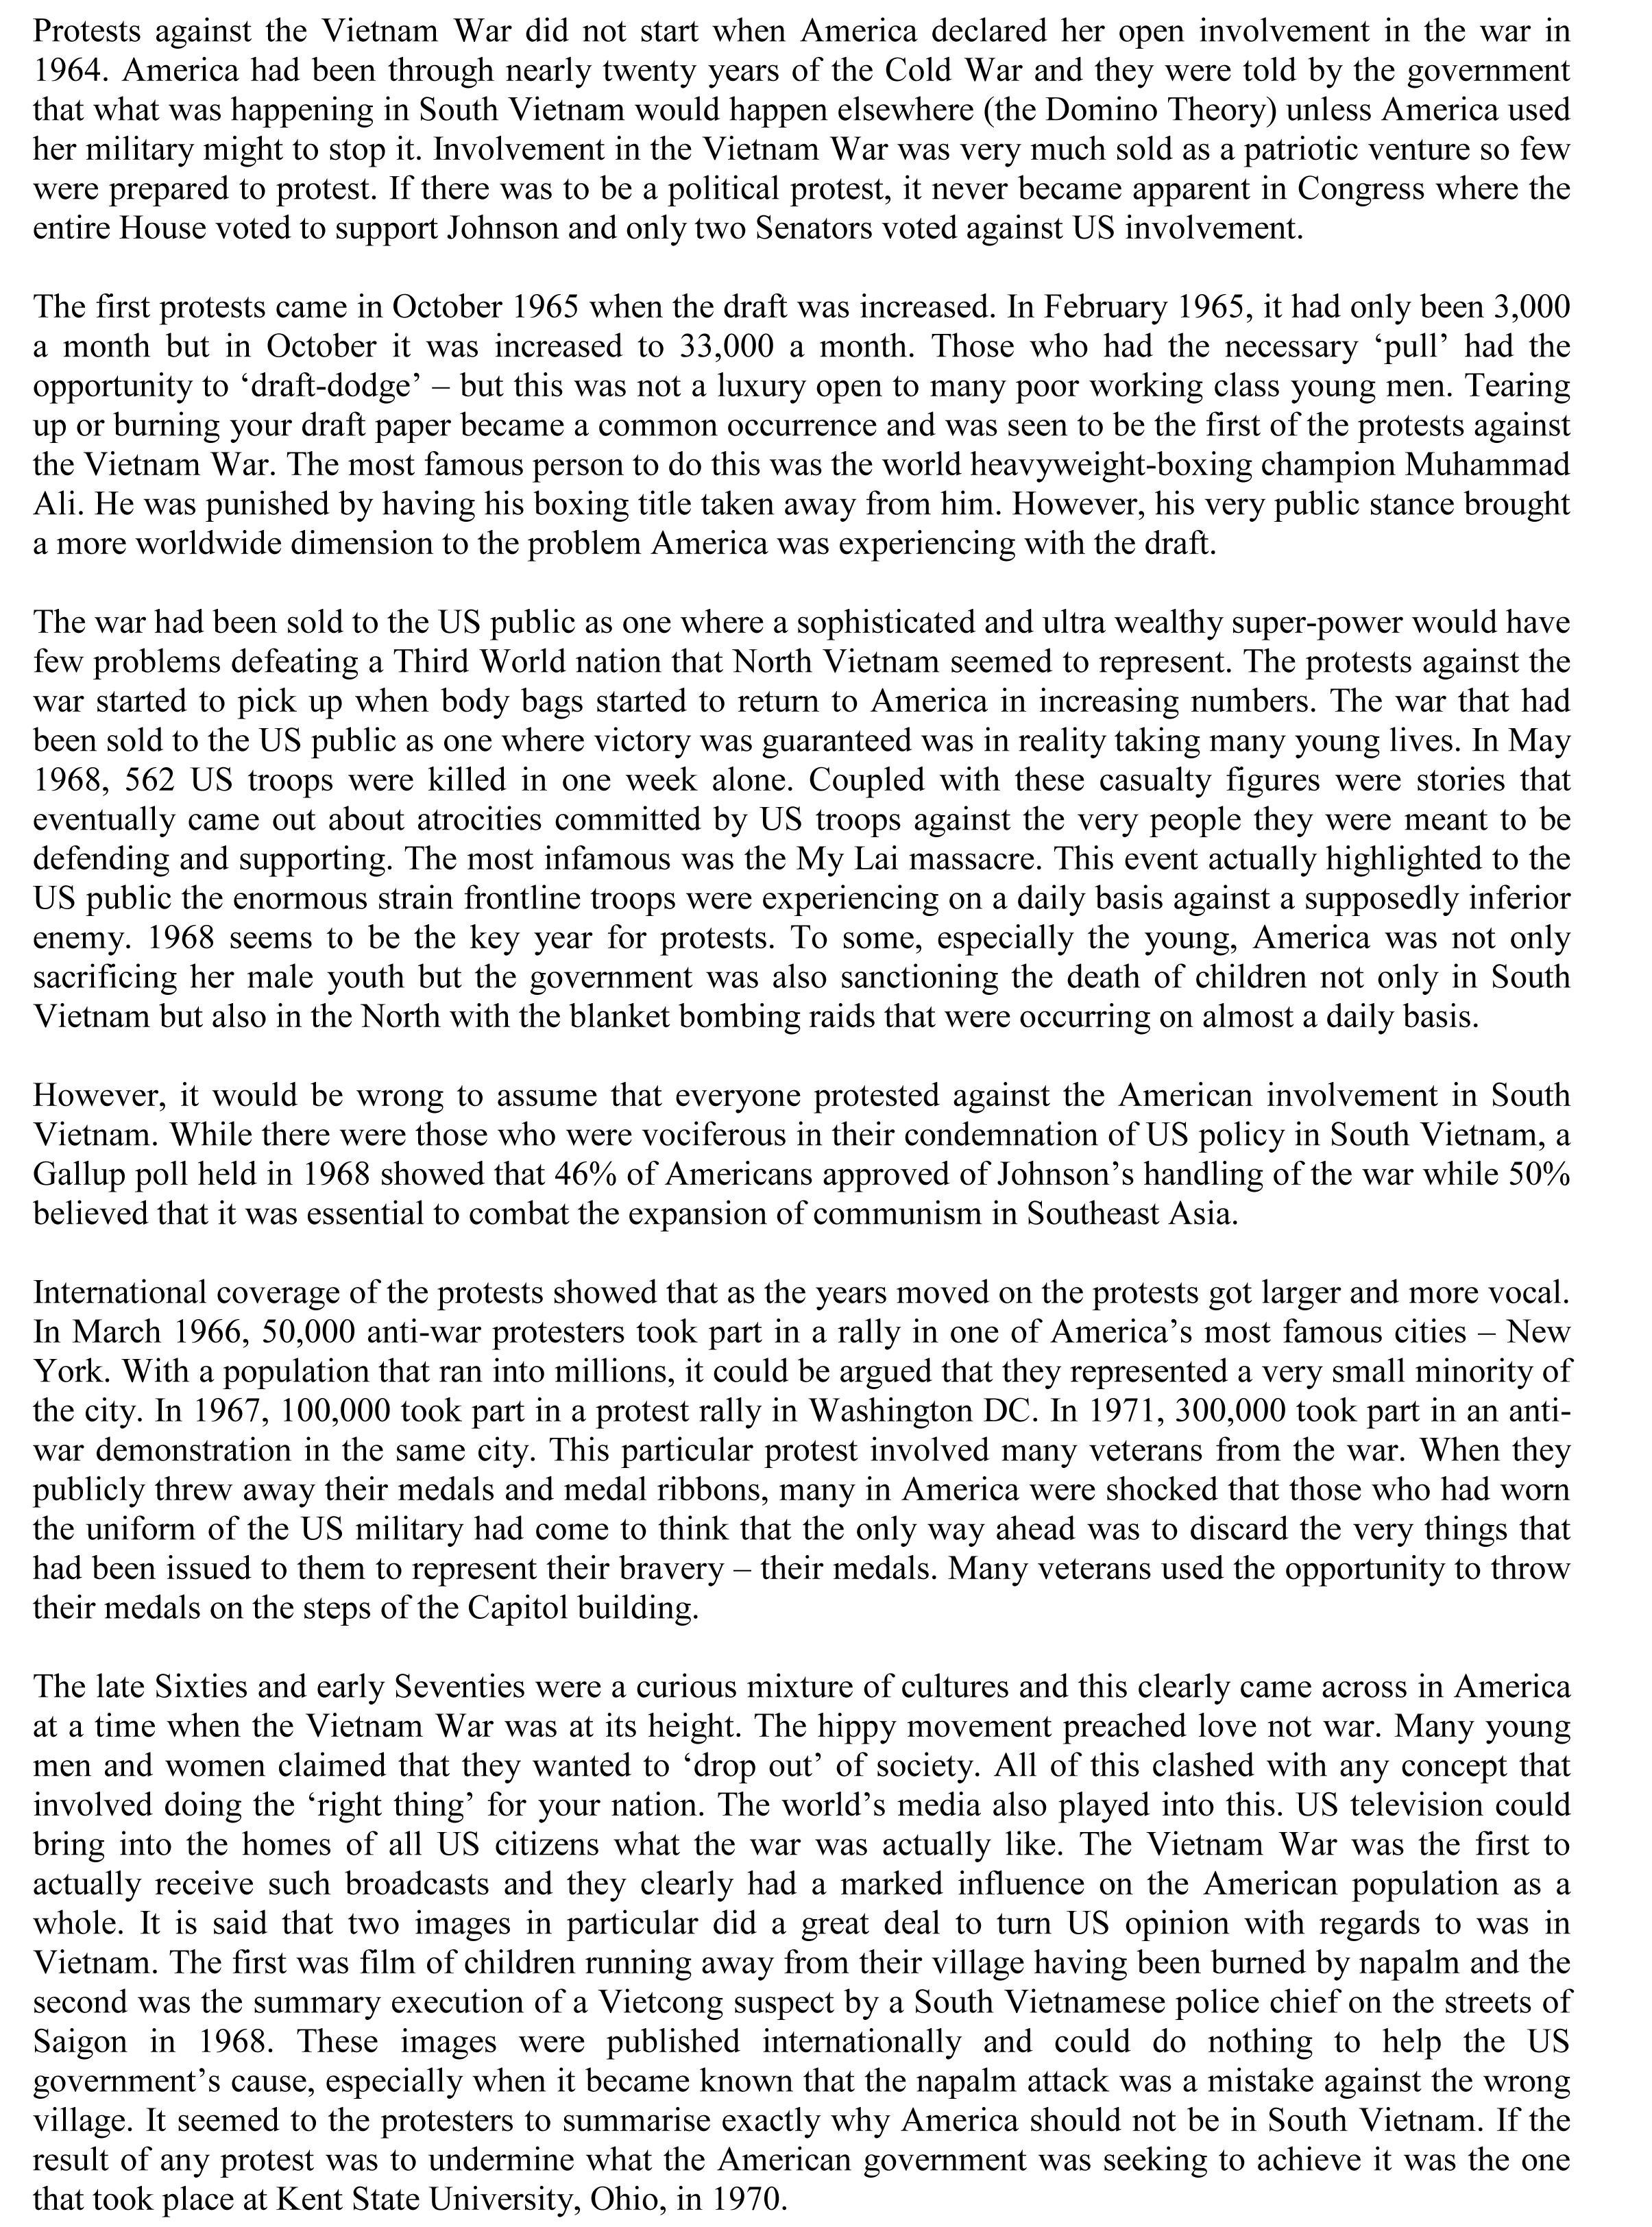 012 Essay Example Vietnam War Narrative Vs Wondrous Descriptive Studymode And Writing Igcse Ppt Full